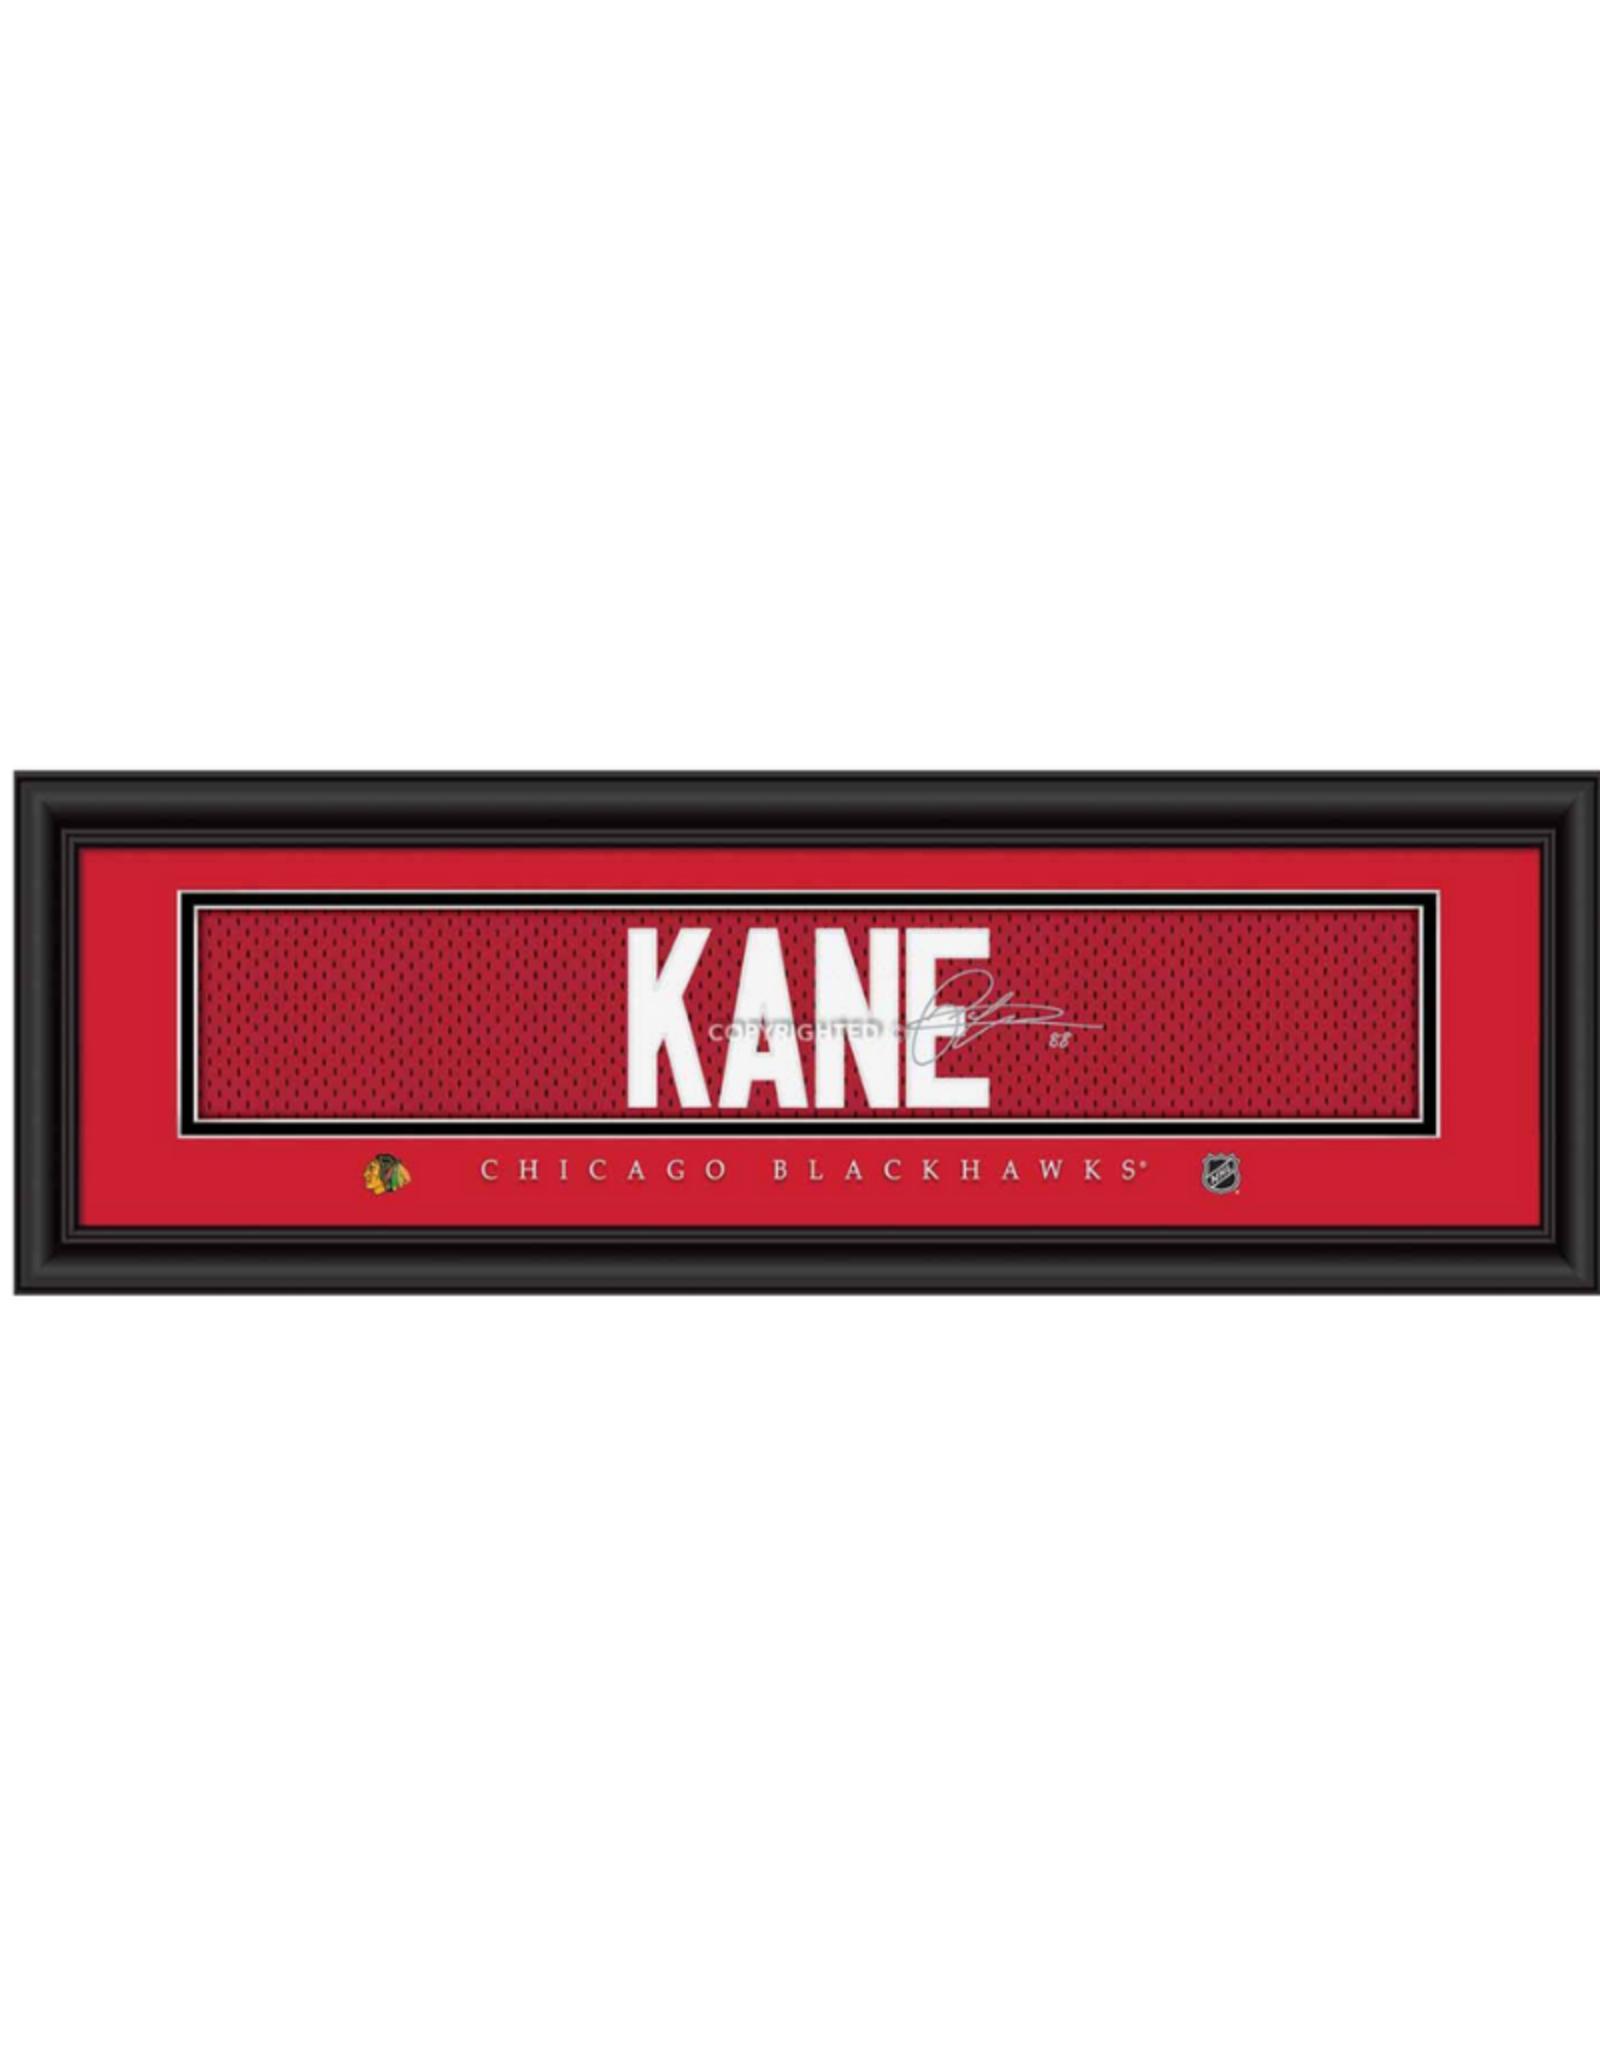 Framed Signature Nameplate Patrick Kane Chicago Blackhawks